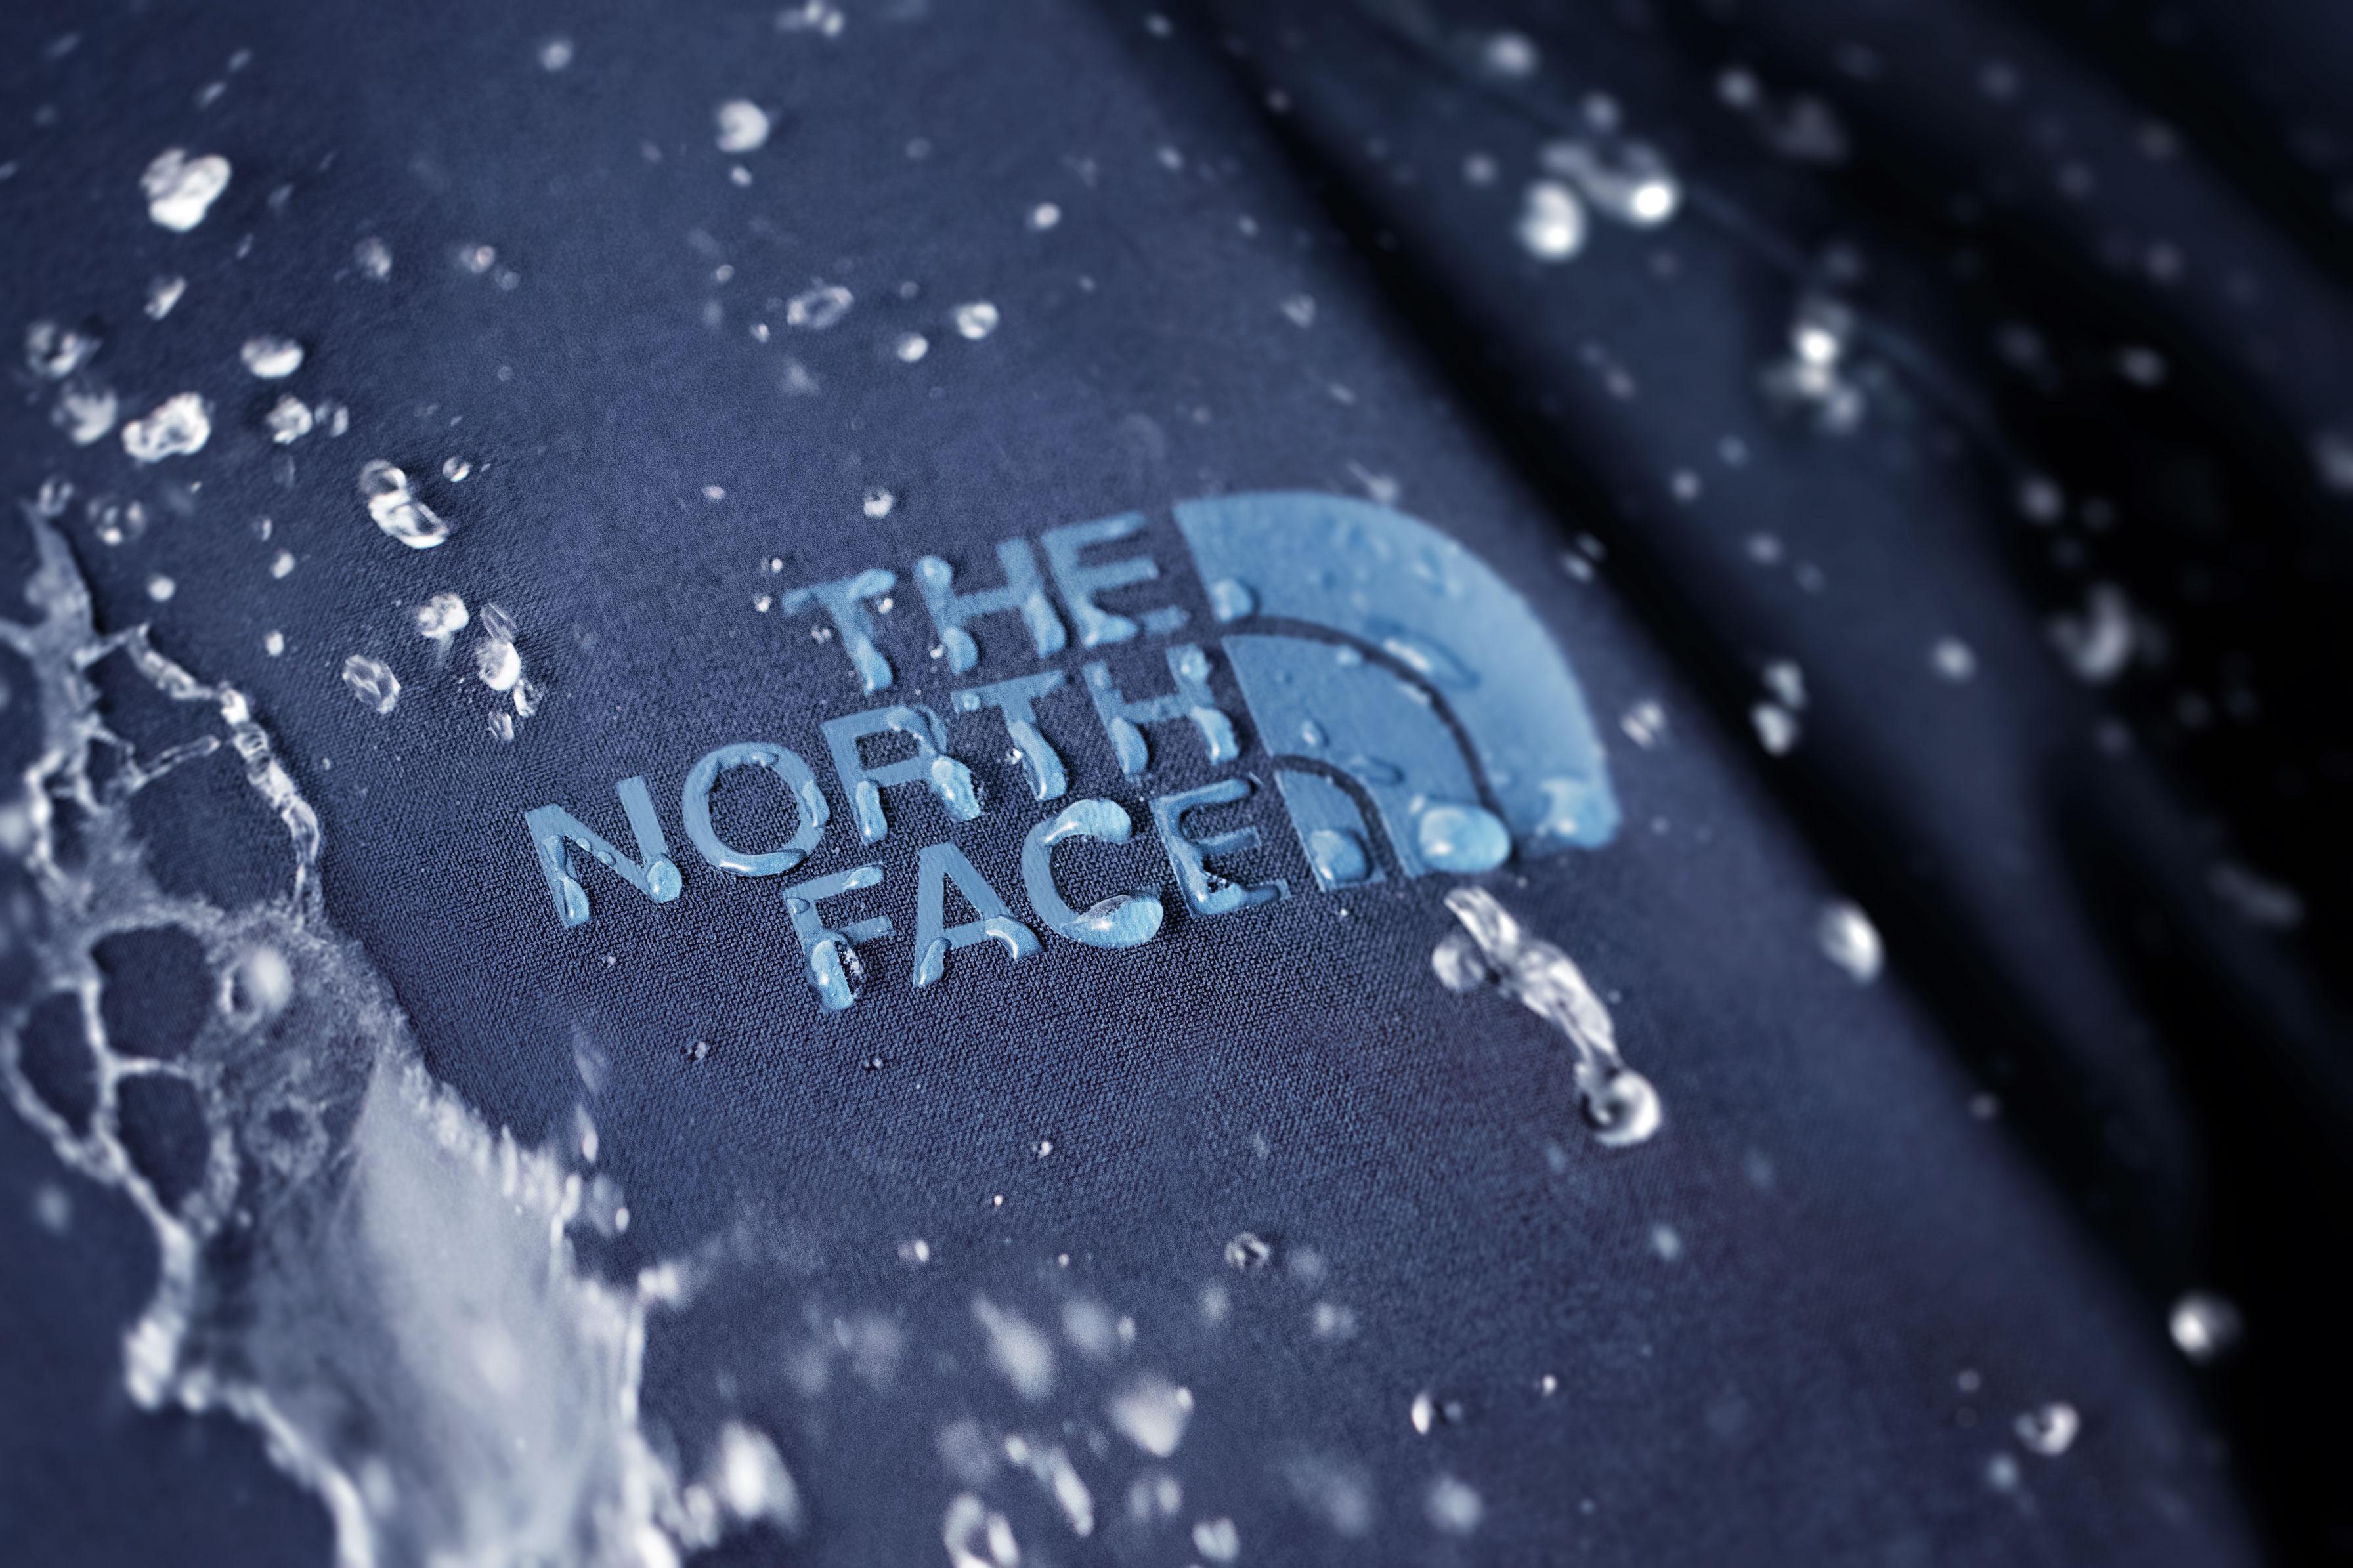 The North Face's Apex Flex - Rain Jacket